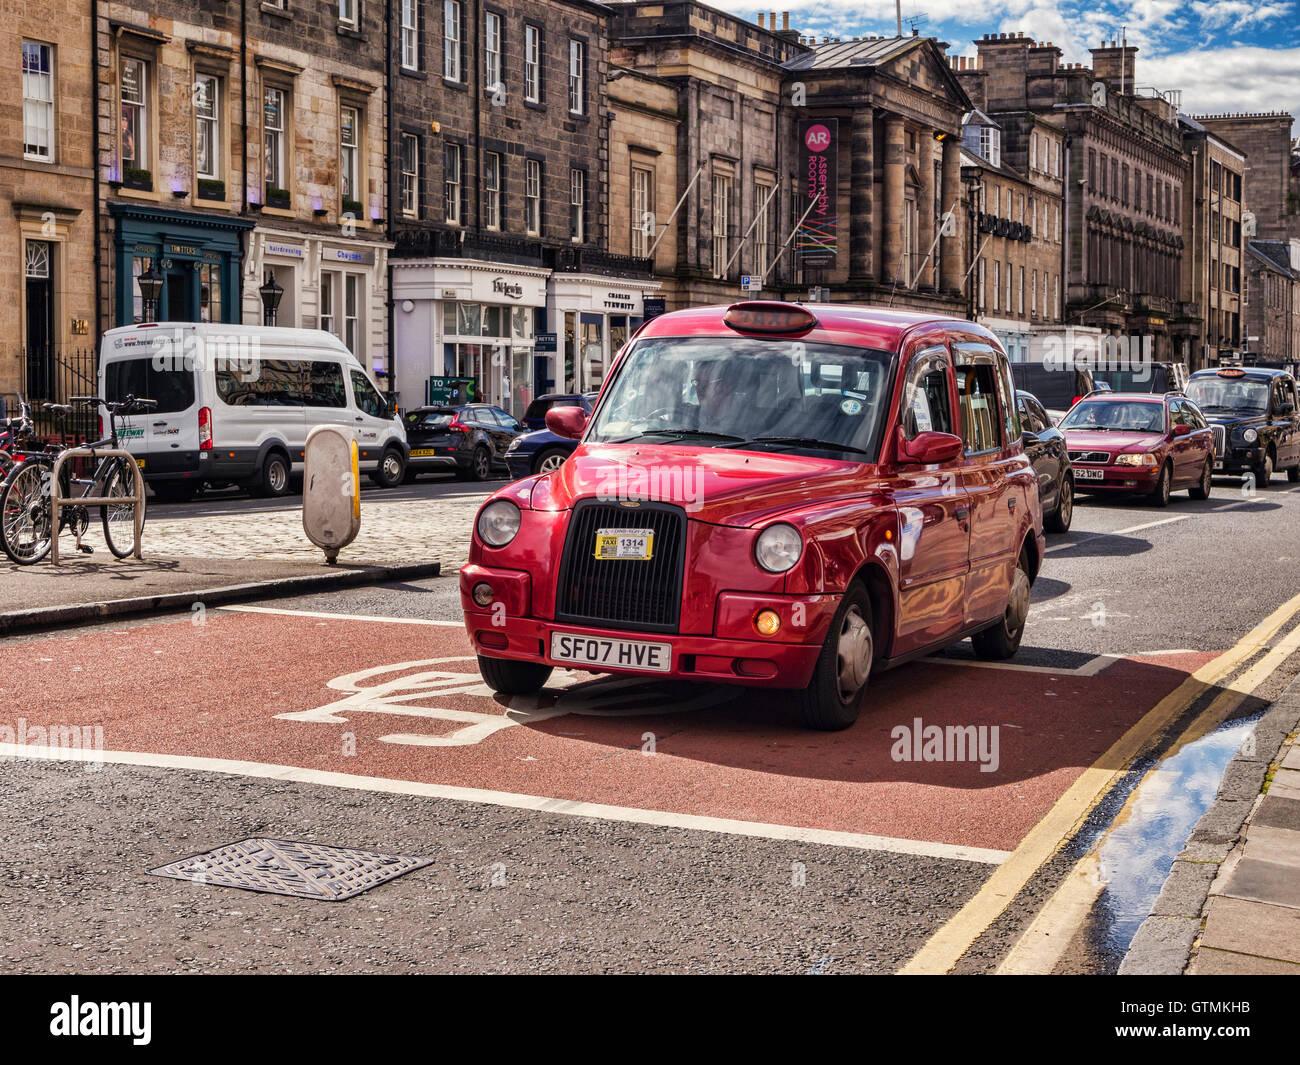 Red taxi cab in George Street, Edinburgh, Scotland, UK - Stock Image